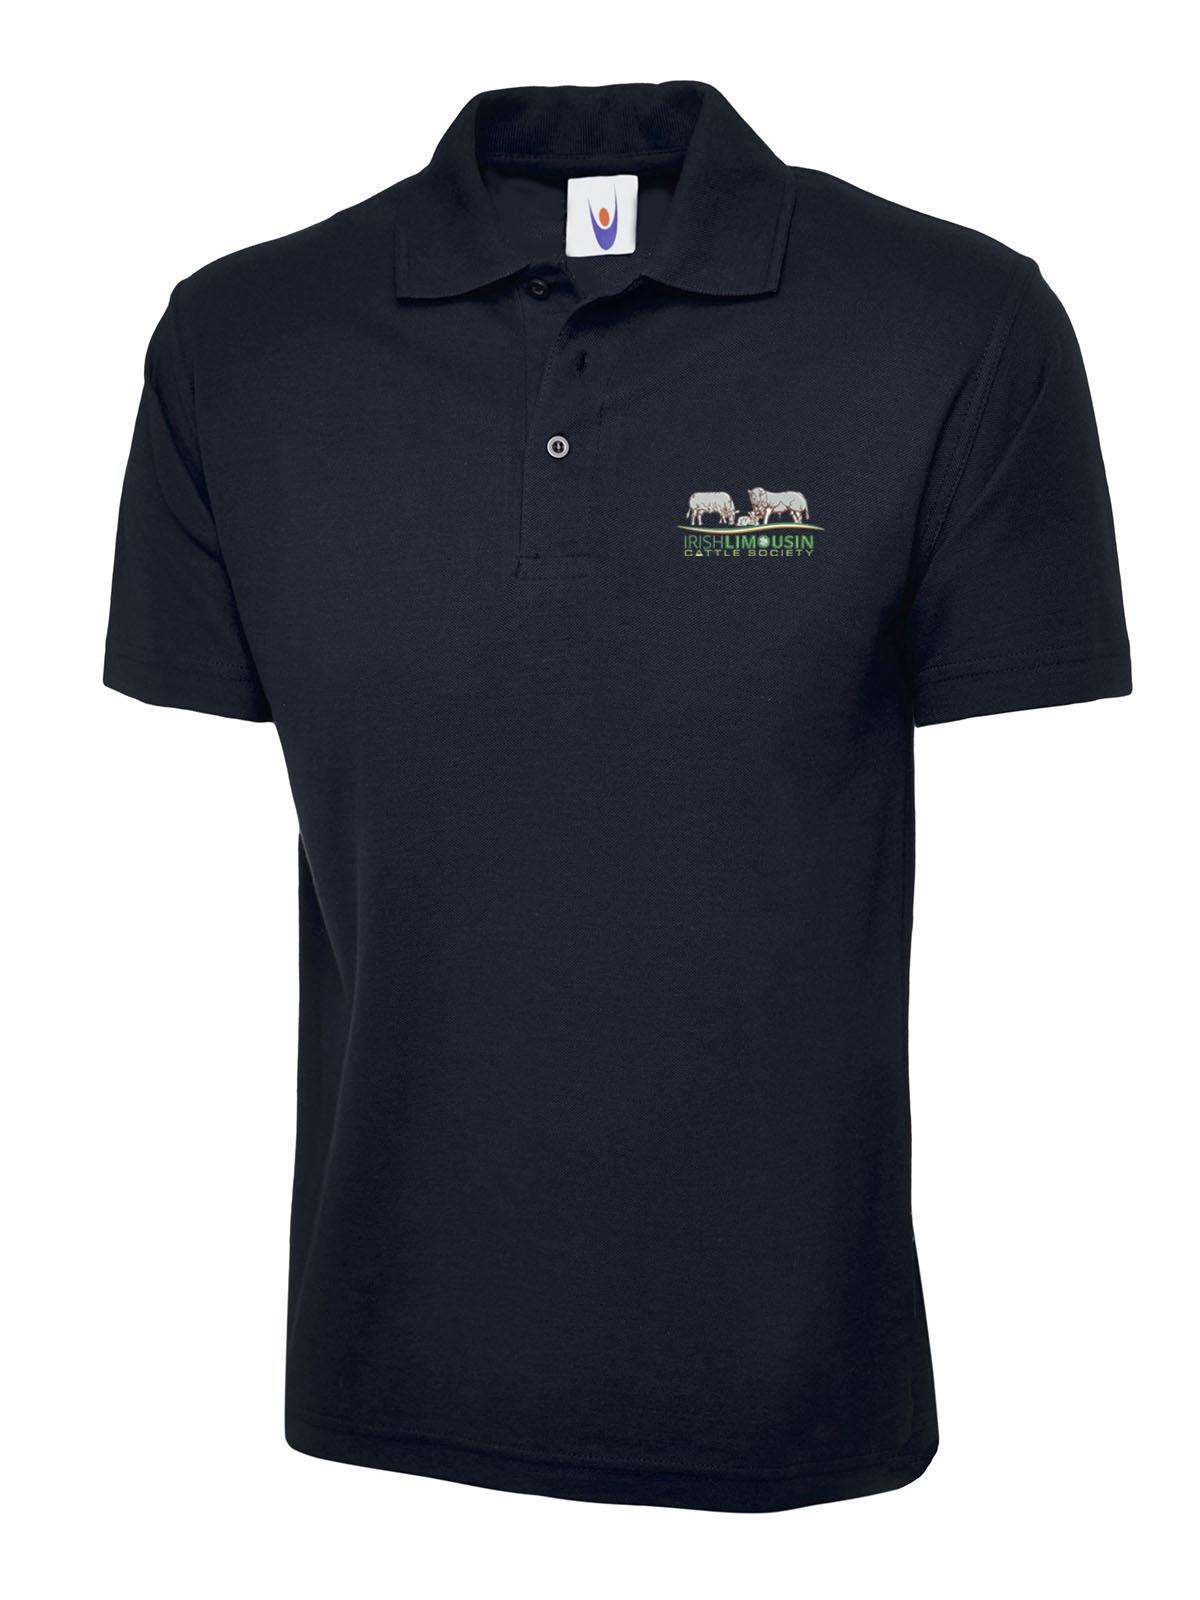 Irish Limousin Cattle Society Unisex Polo Shirt